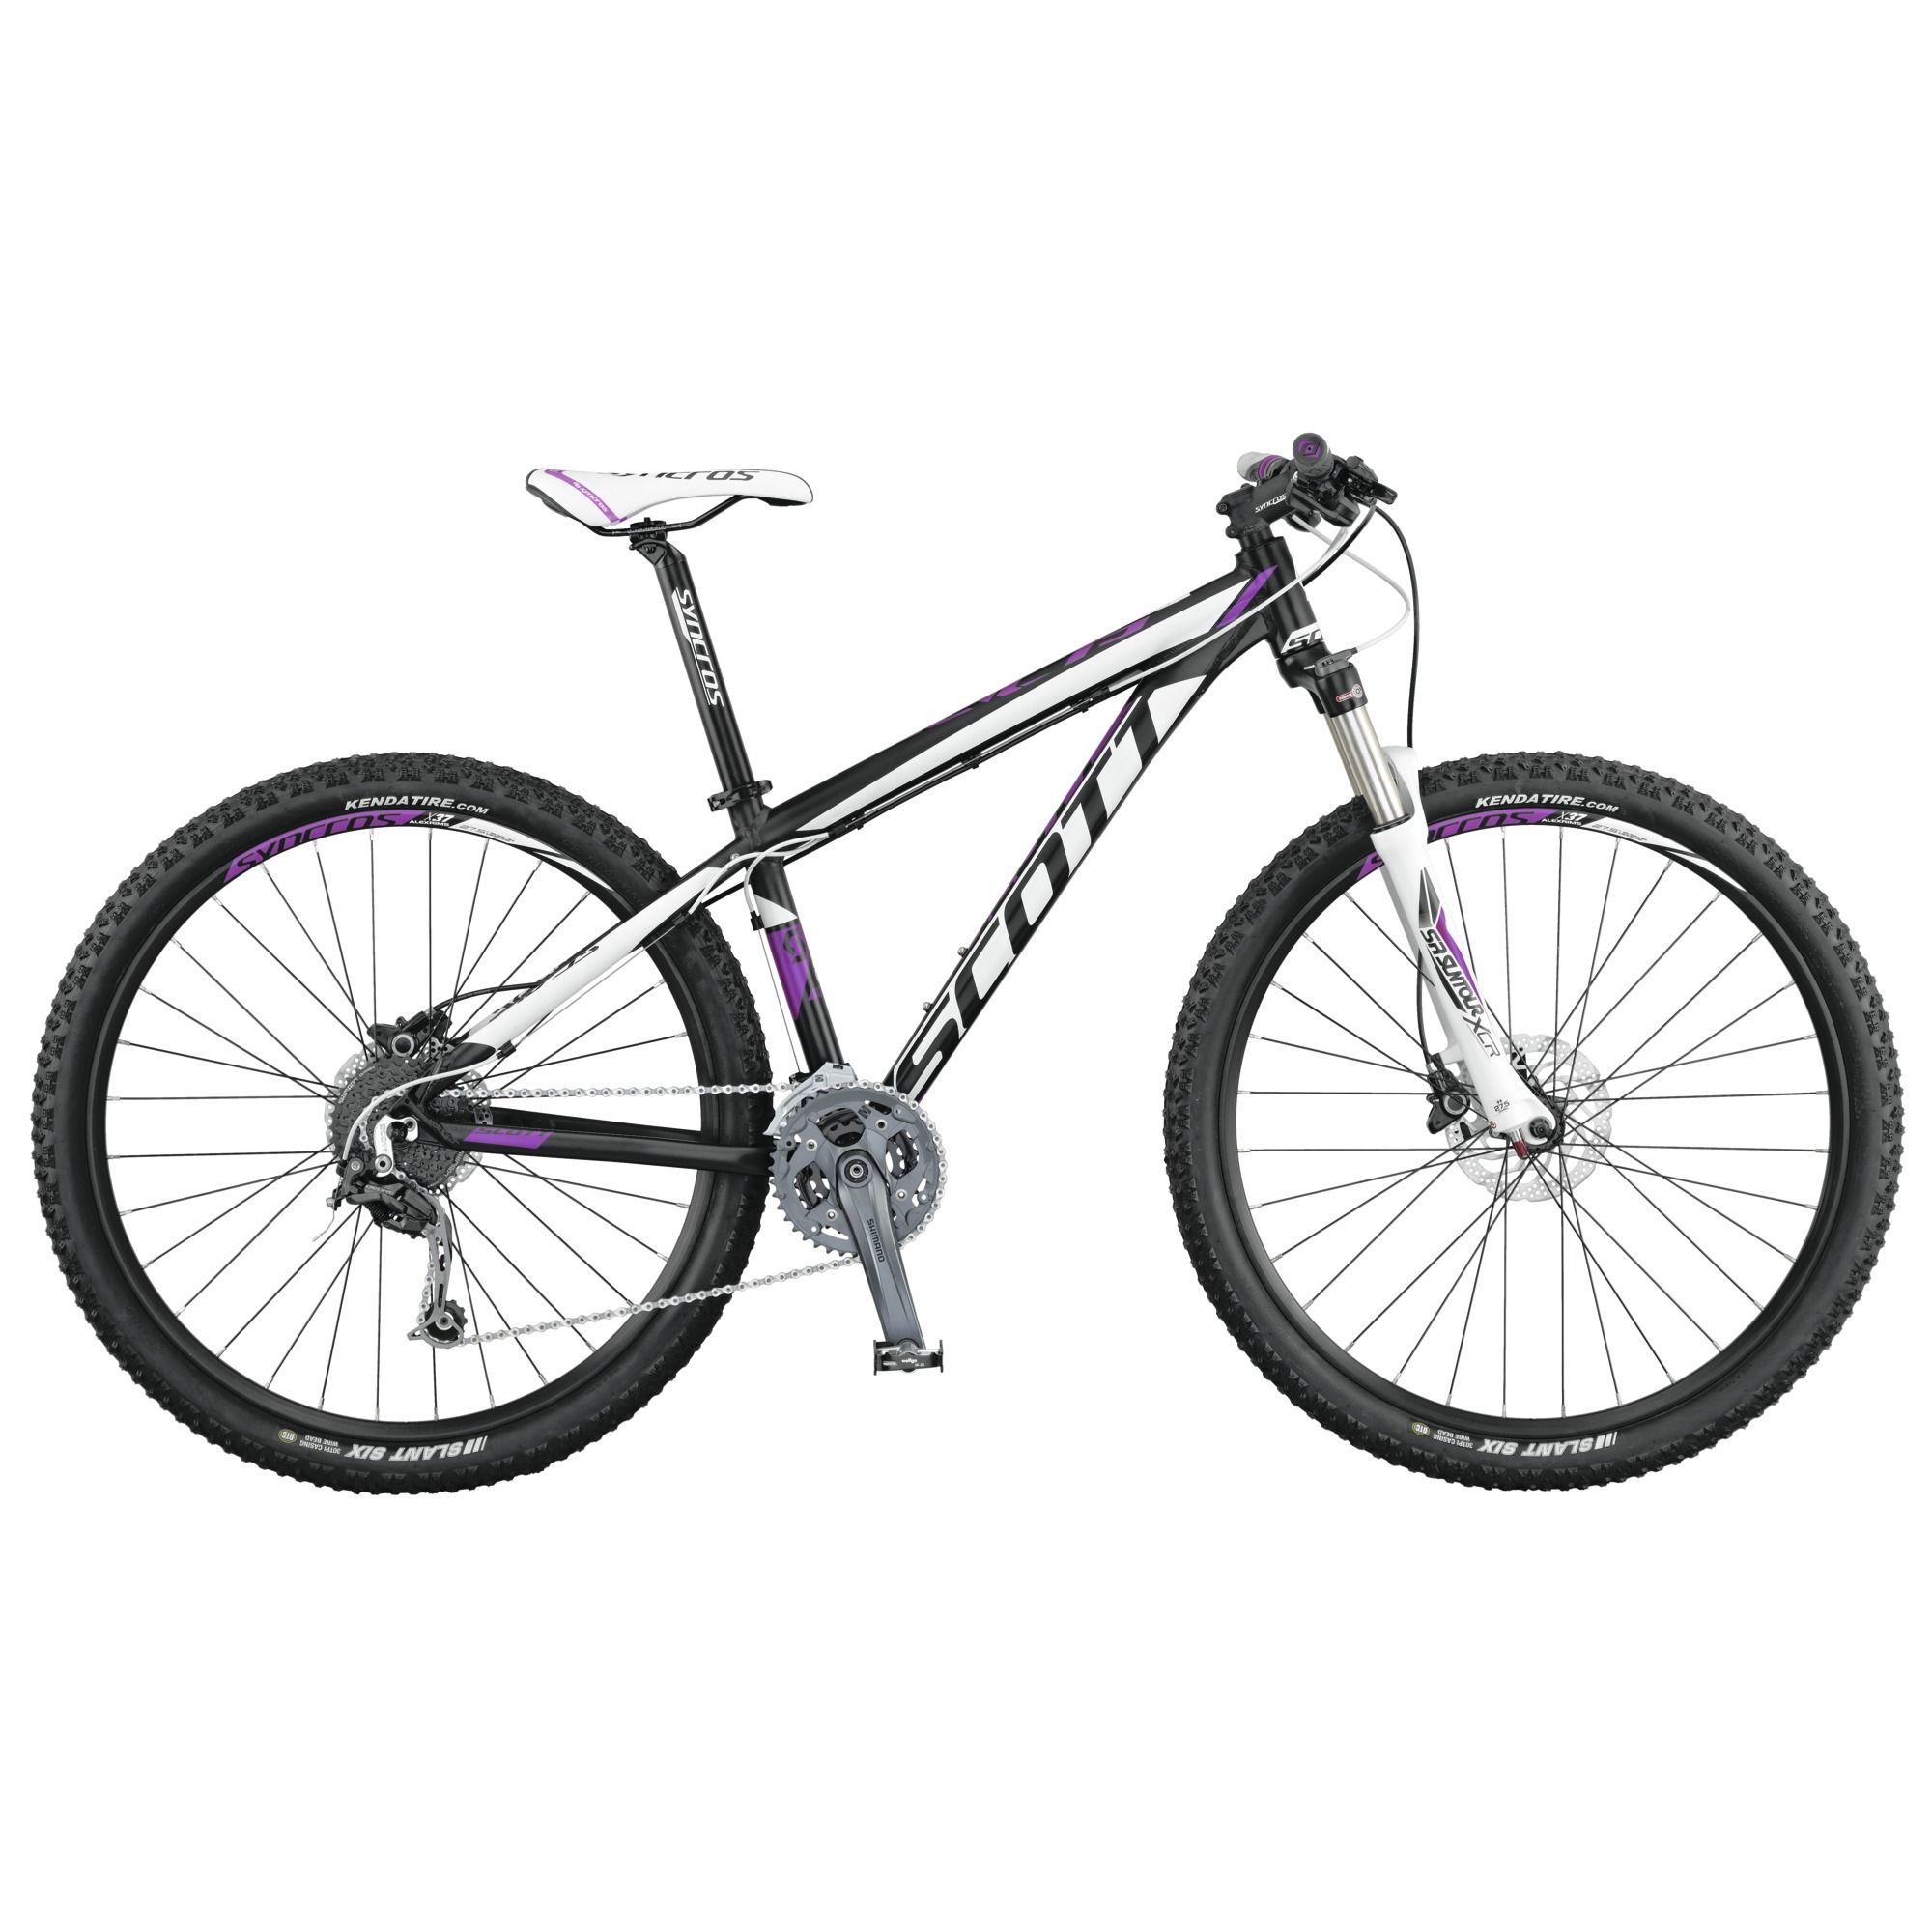 Scott Contessa Scale 730 Bike With 27 5 Wheels Please Scott